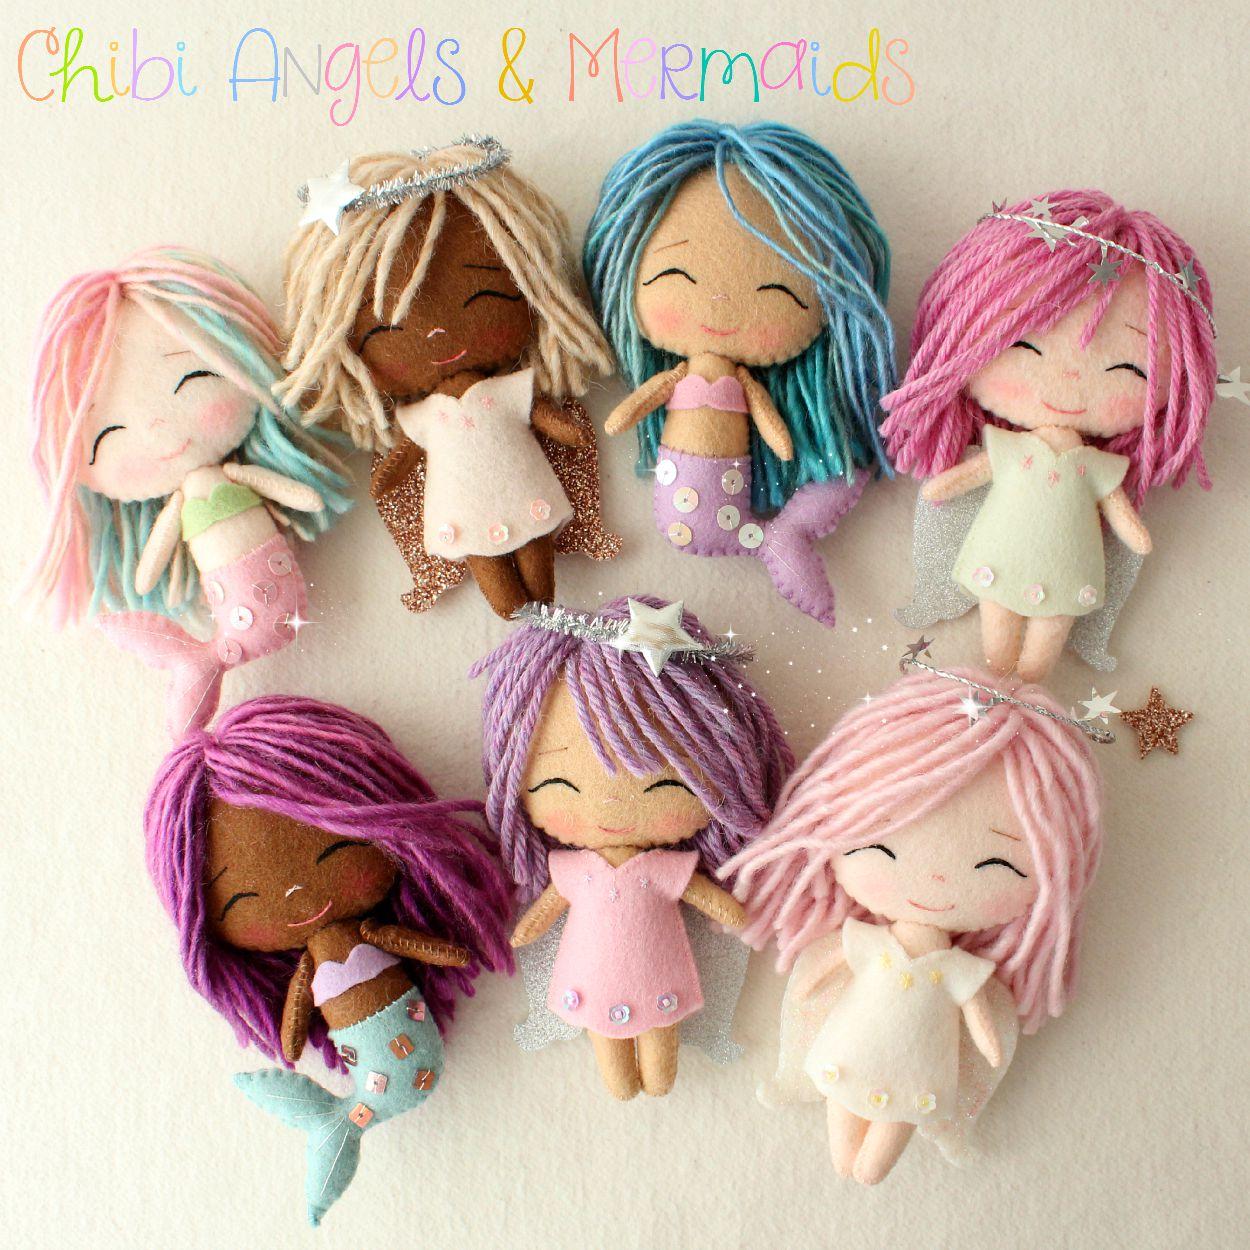 chibi angels and mermaids